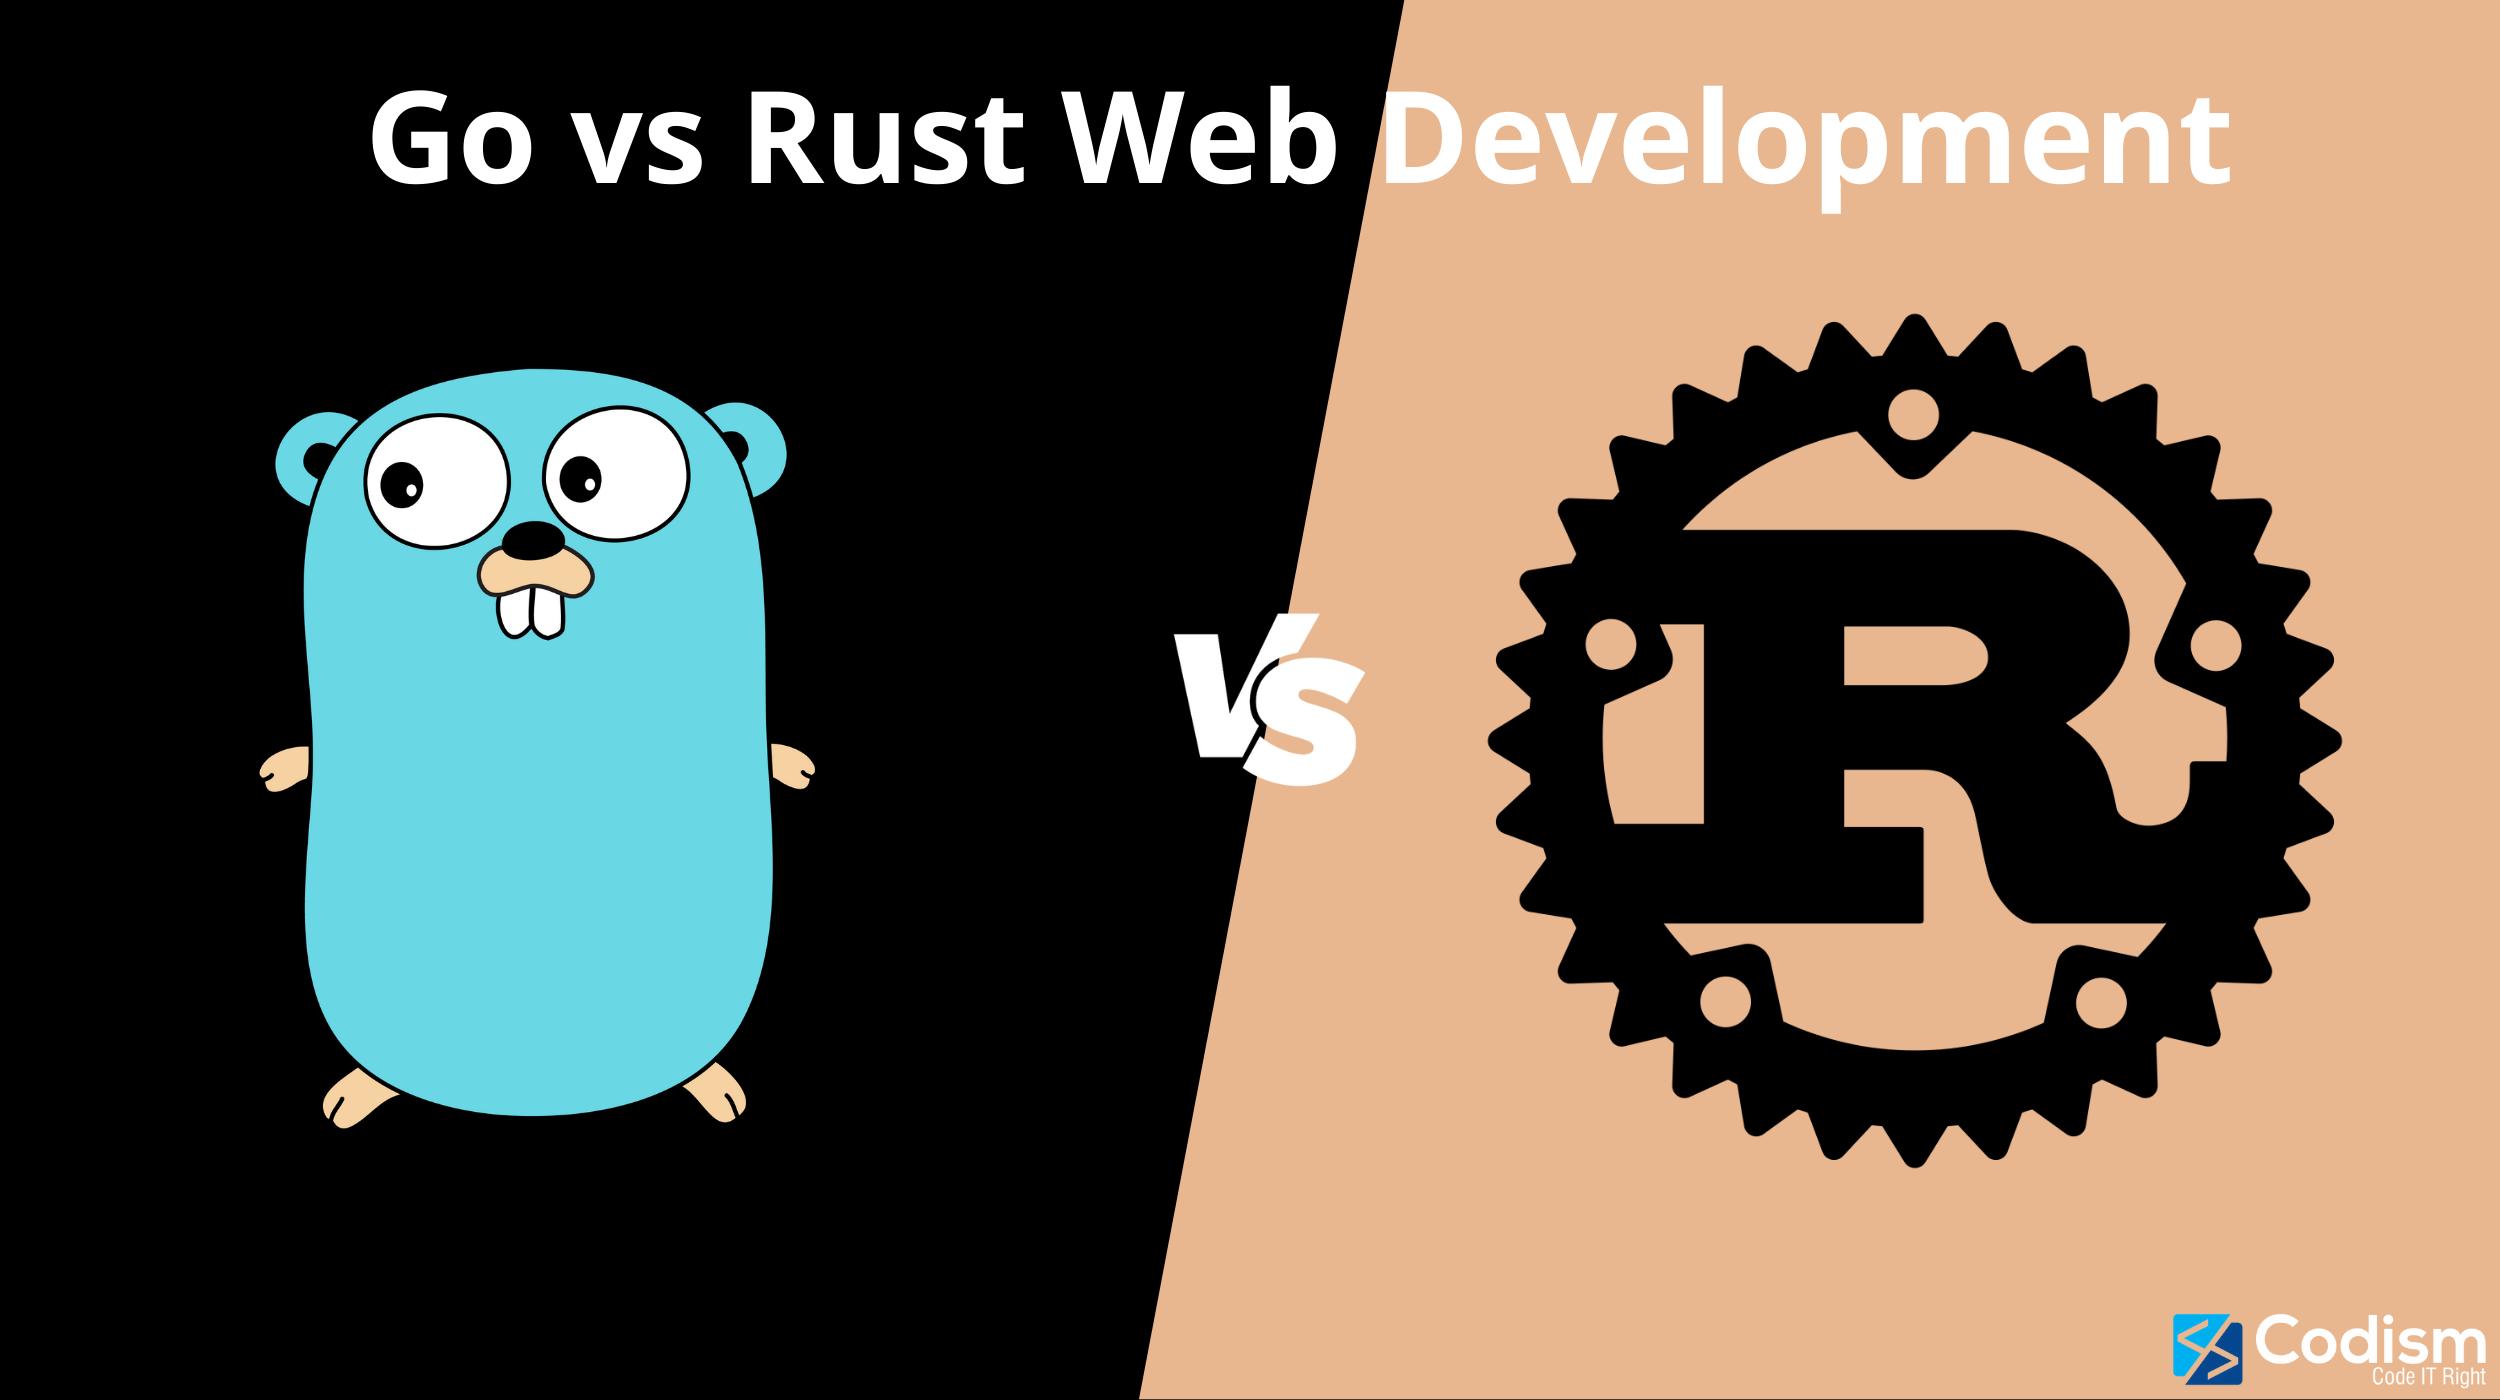 Go vs Rust Web Development (2)